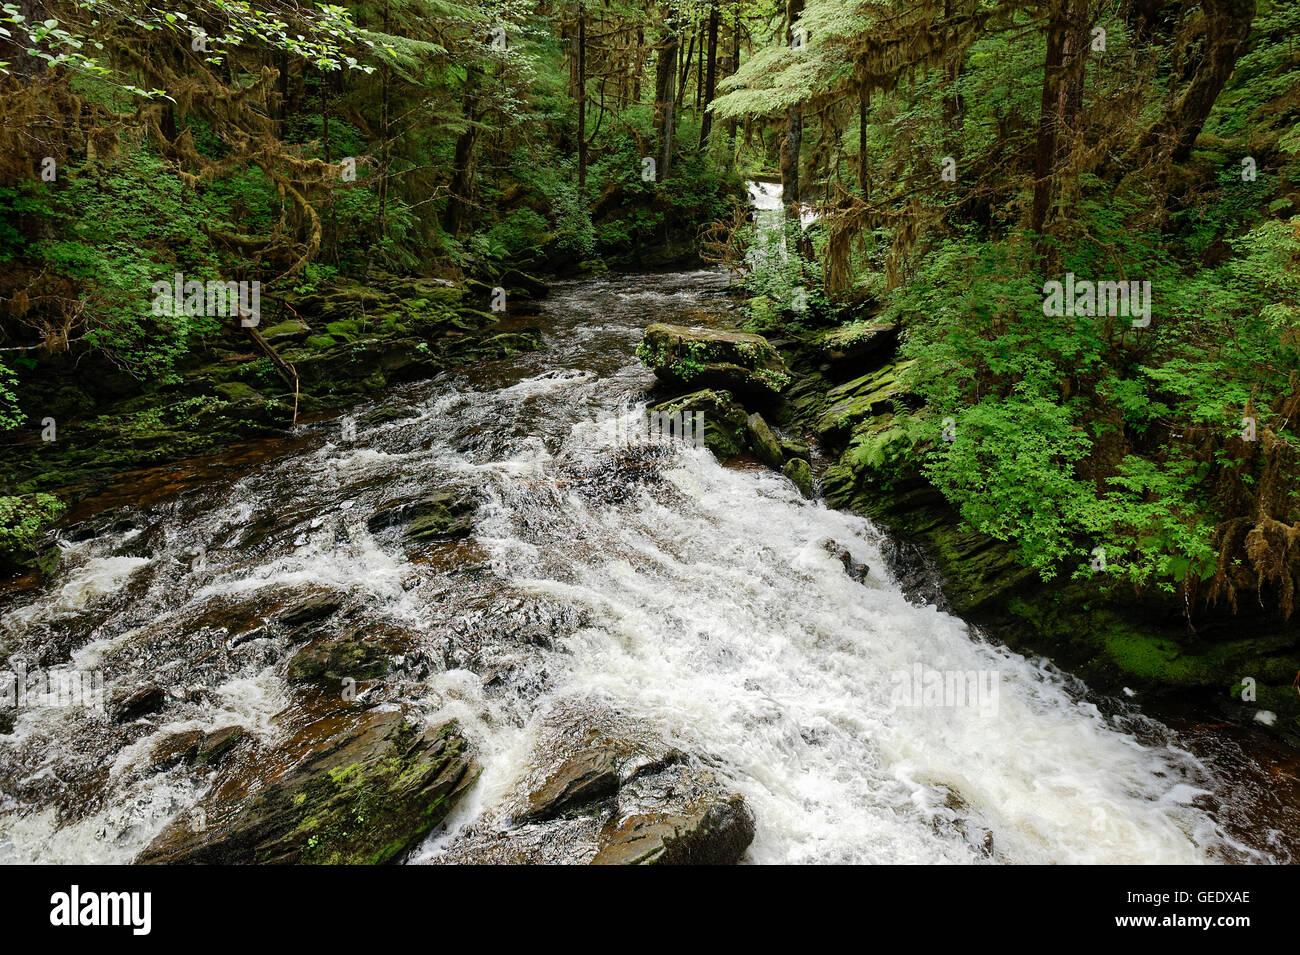 Mountain stream, Revillagigedo Island, Ketchikan, Alaska, USA Stock Photo